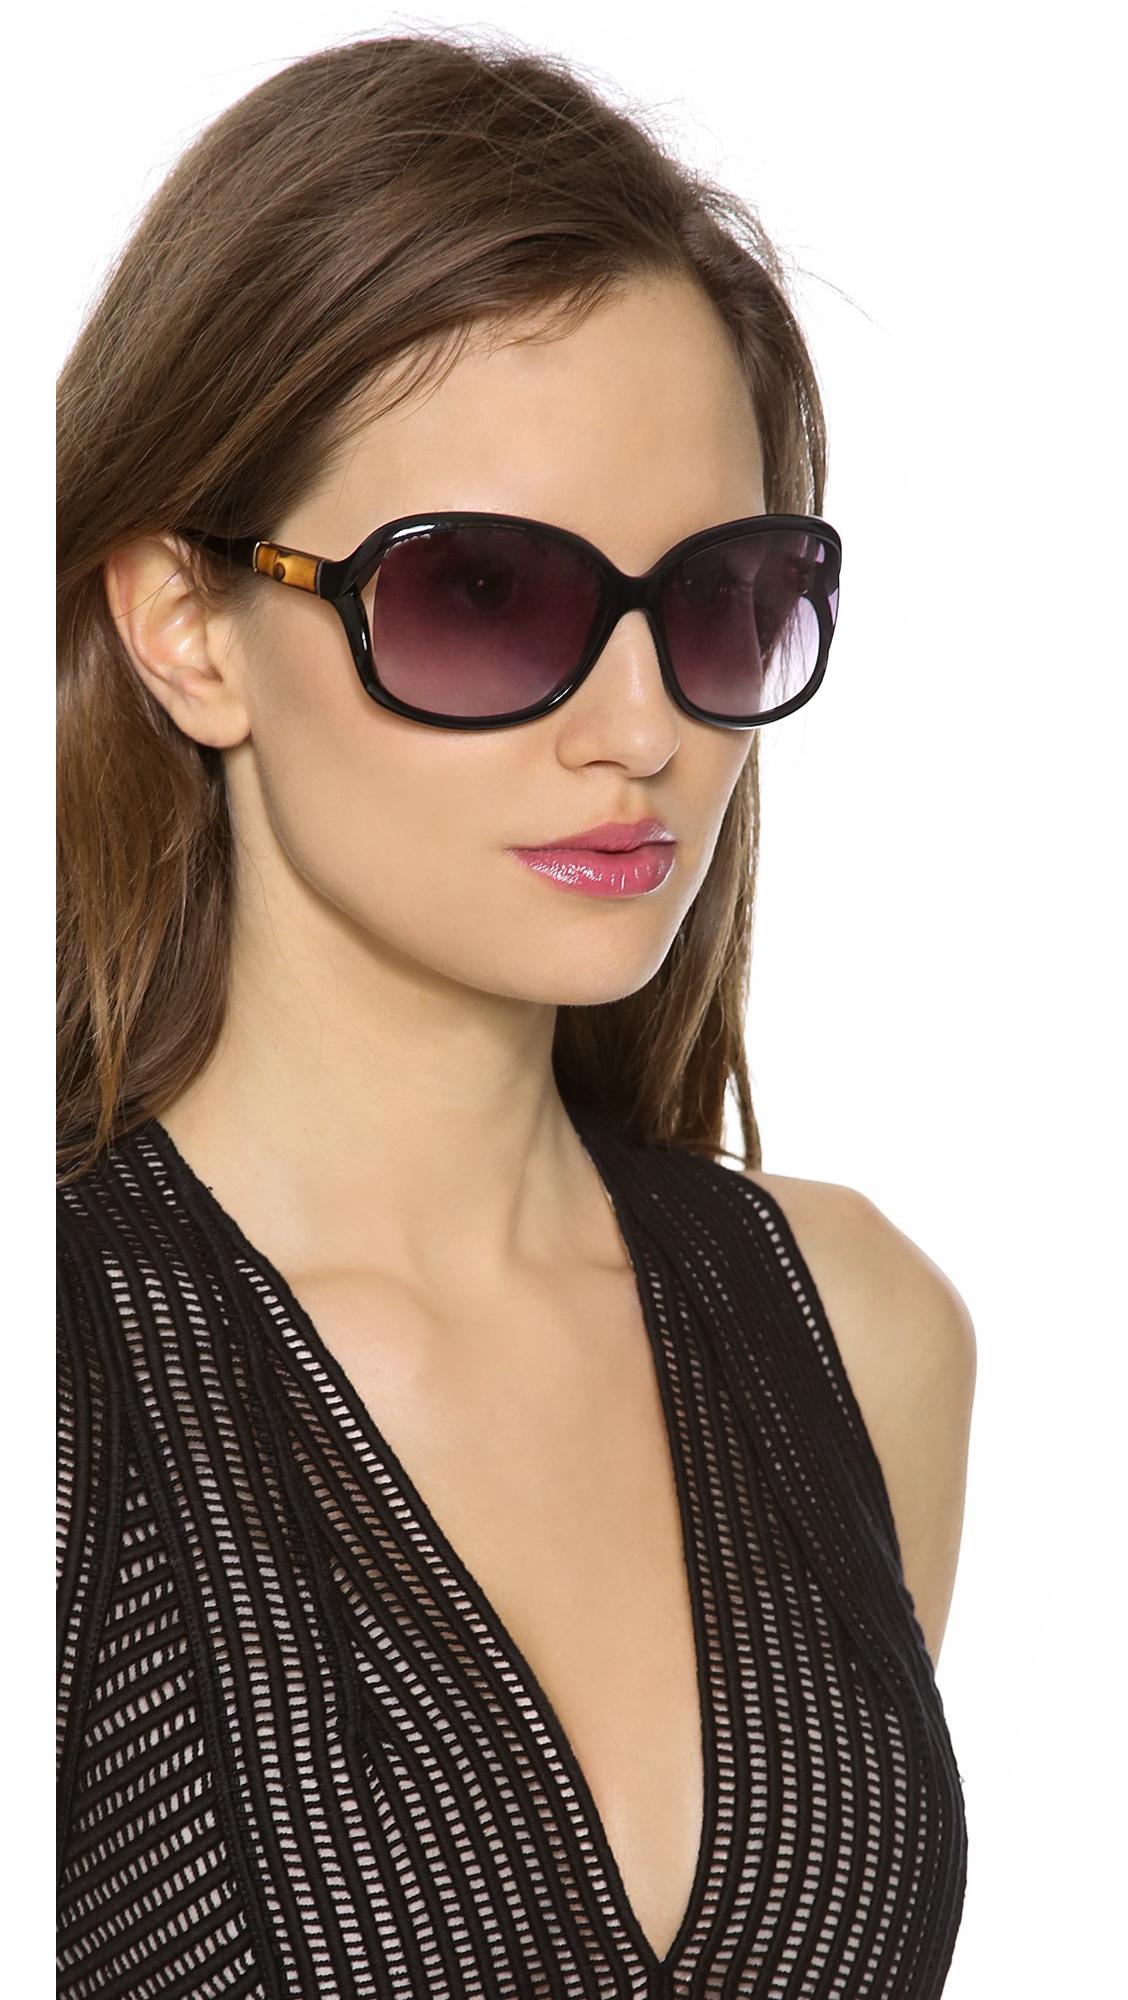 8937d69f97f80 Gucci Open Side Sunglasses - Shiny Black Grey Gradient in Black - Lyst